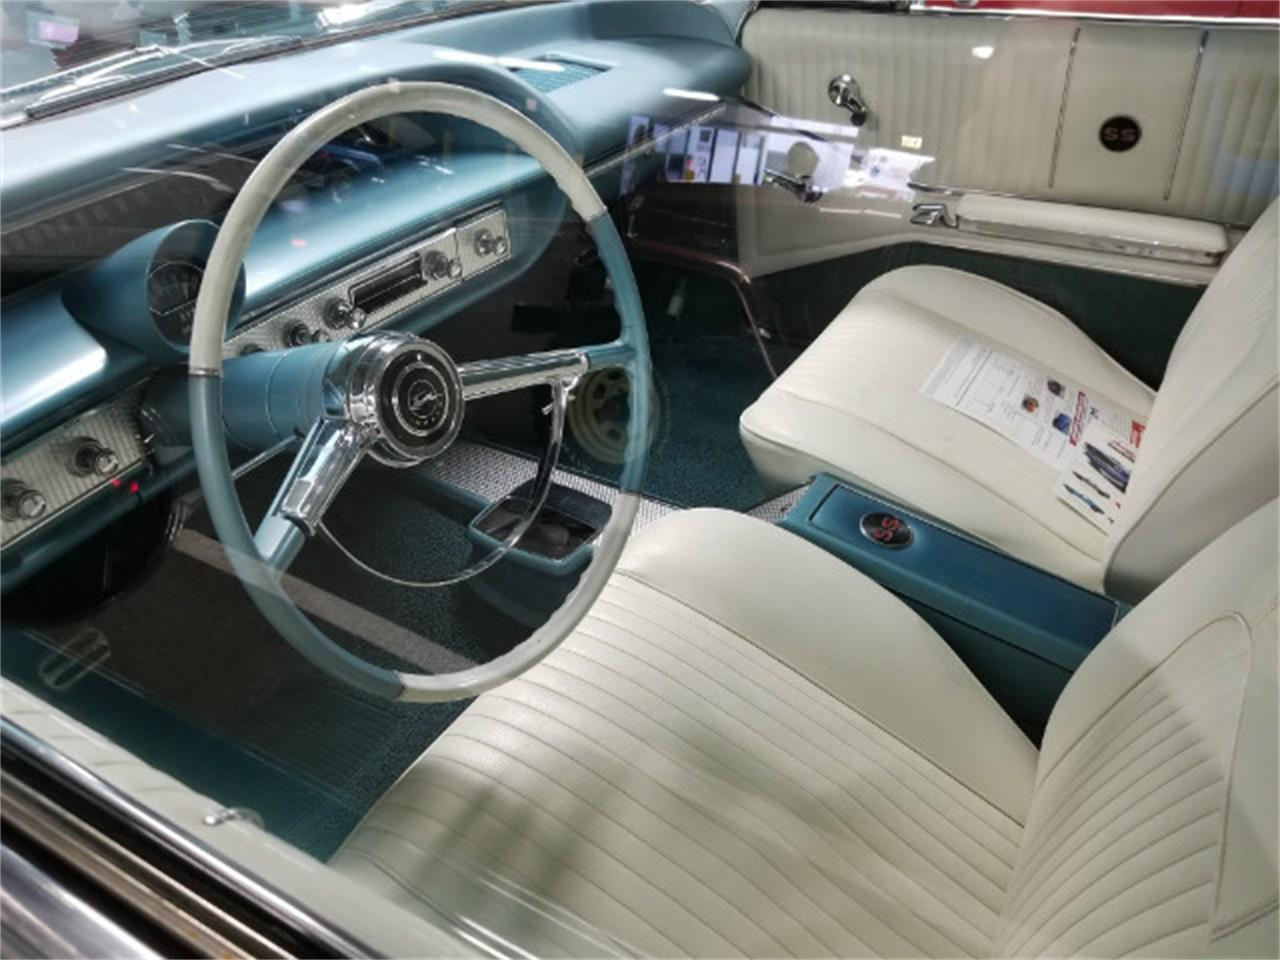 Awe Inspiring 1964 Chevrolet Impala For Sale Classiccars Com Cc 1037138 Short Links Chair Design For Home Short Linksinfo